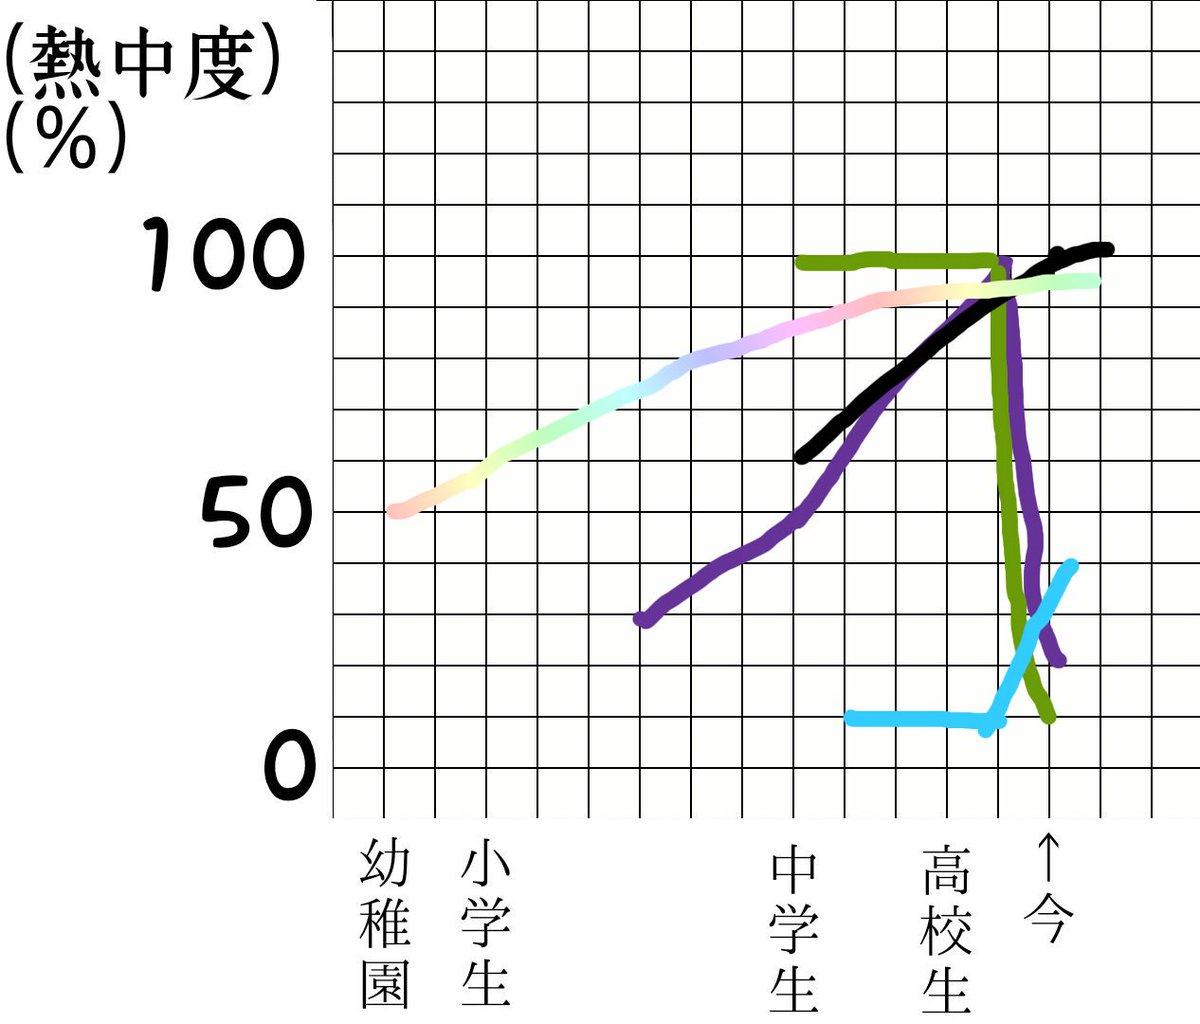 test ツイッターメディア - クソ雑だけど今の熱中度をグラフにしてみた笑 紫色→乃木 緑色→欅 水色→日向(ひらがなけやき含) 黒→彼女 虹→ディズニー https://t.co/nltbEXAYrL